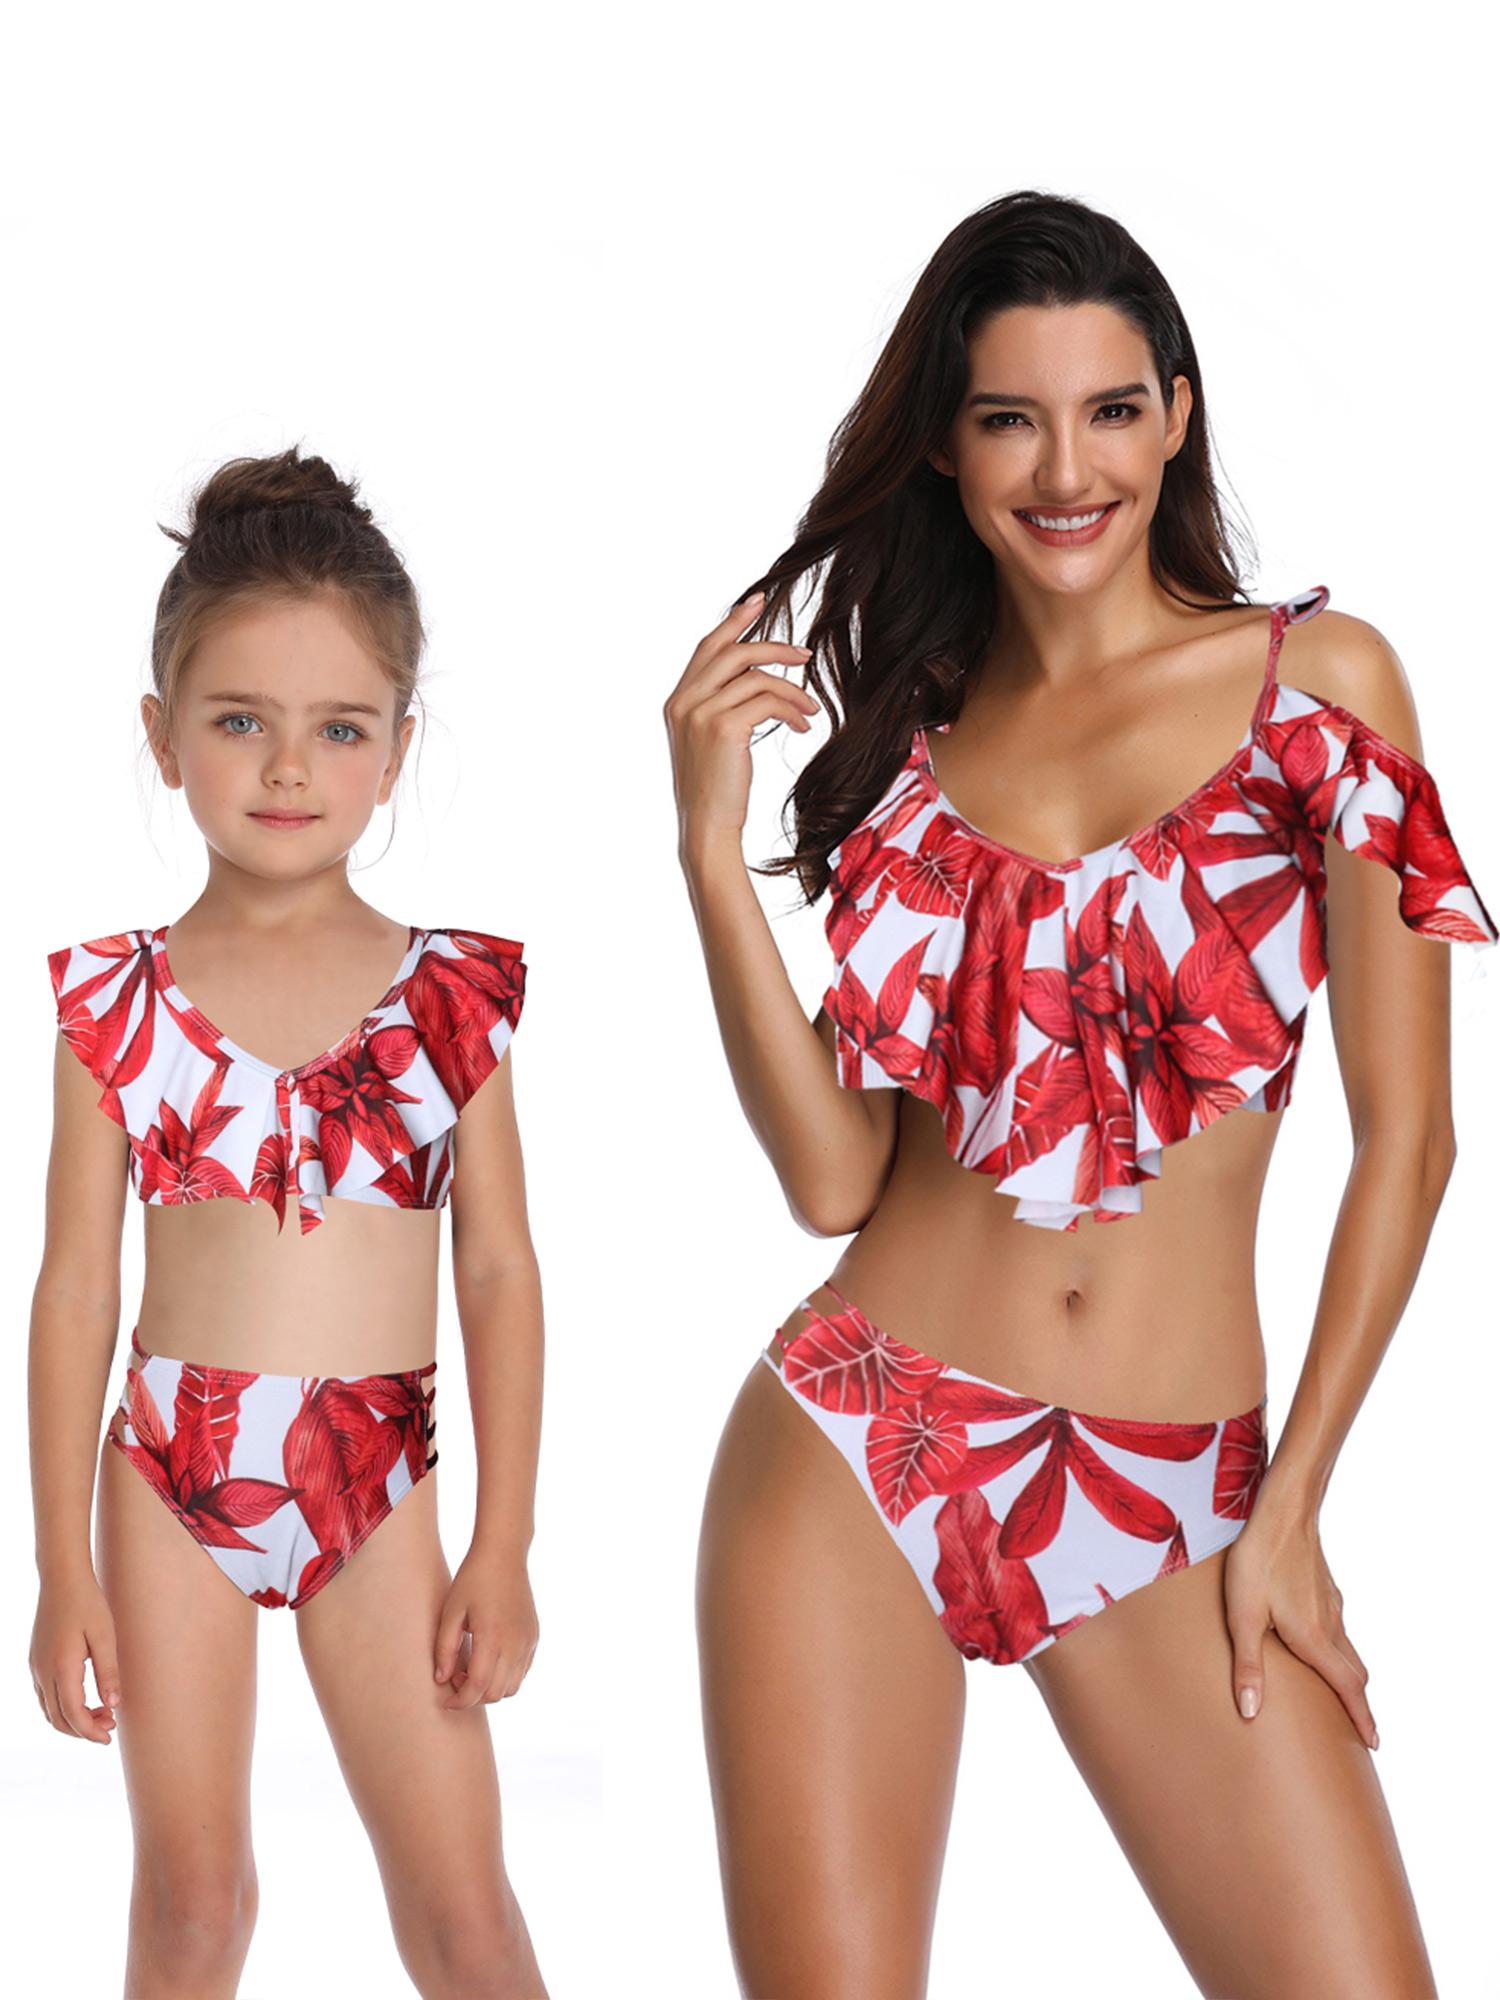 Girls Kid Swimwear 2-Piece Bikini Swimsuit Set Bathing Suit Tankini Beachwear